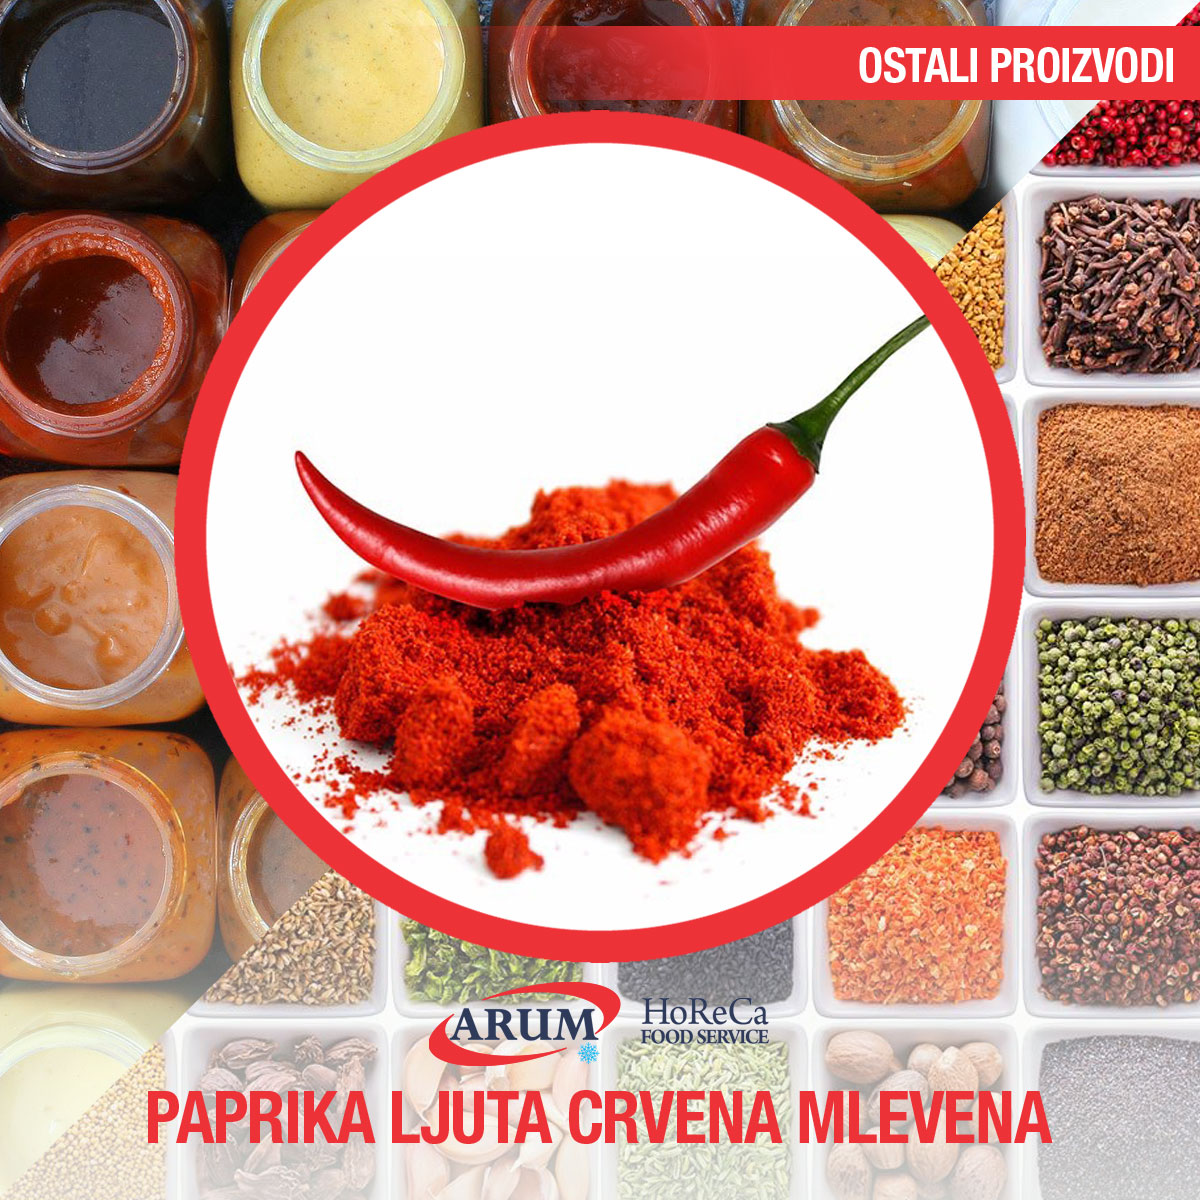 Paprika ljuta crvena mlevena 1kg